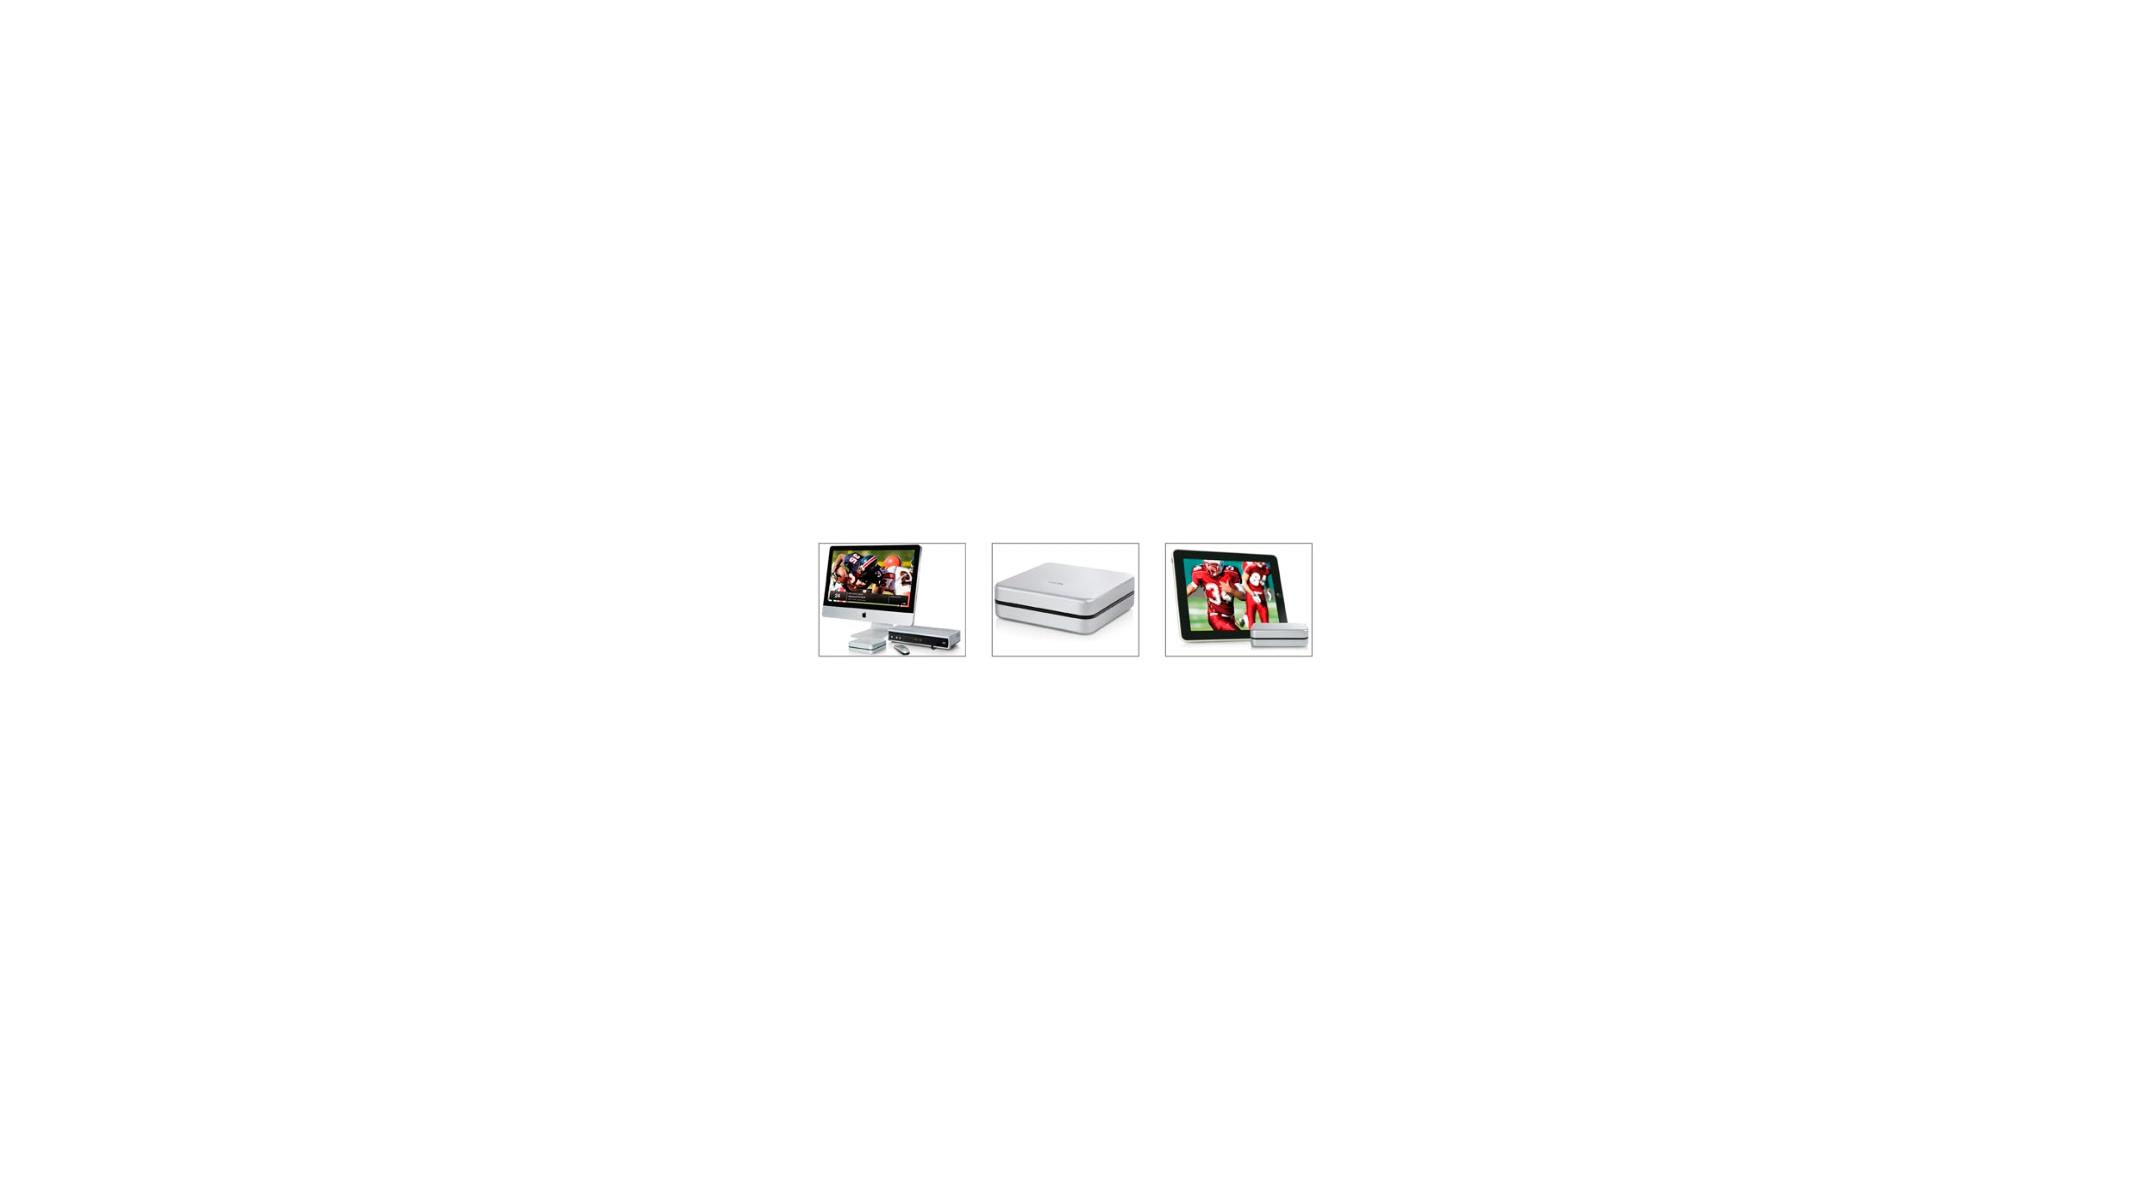 Elgato Debuts EyeTV HD DVR For Mac, iPhone And iPad